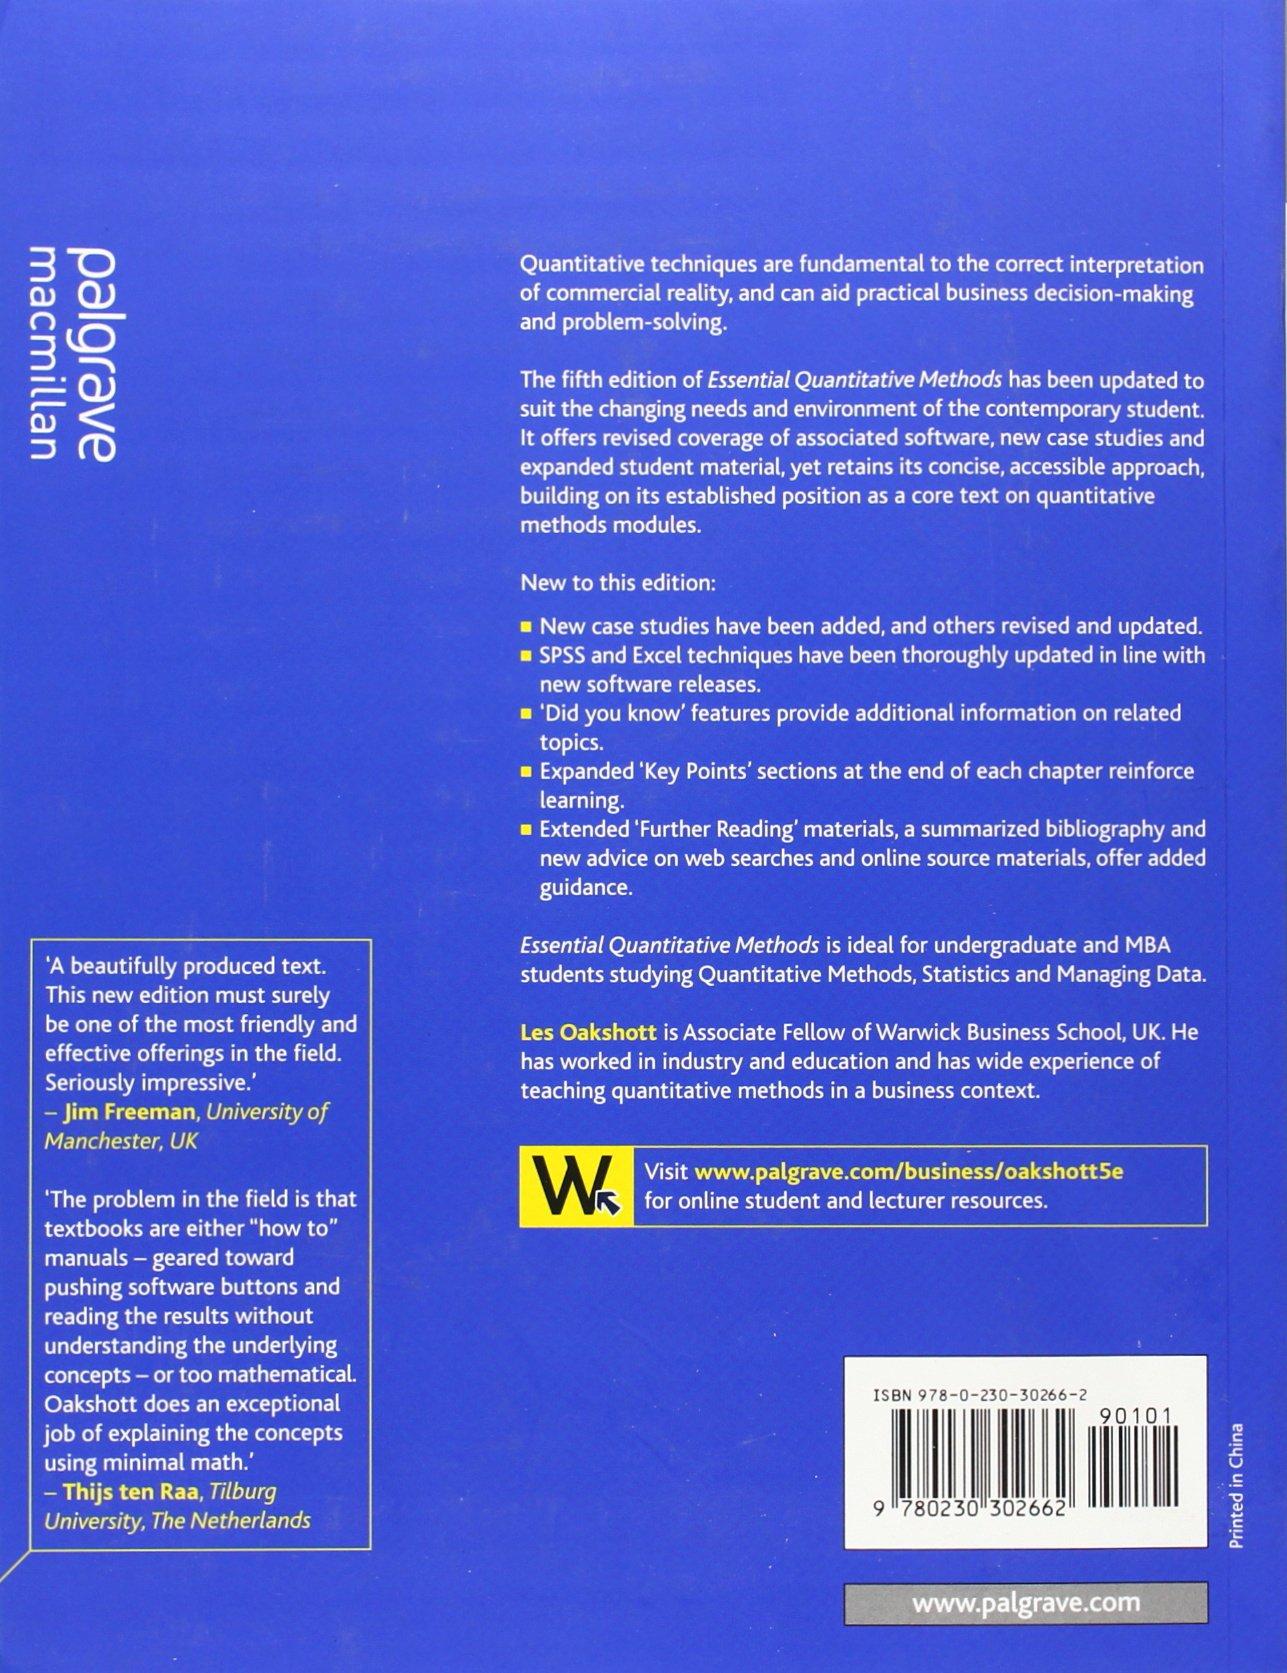 quantitative methods chapter 5 summary Chapter 5 qualitative research methods kristine florczak loading qualitative & quantitative research - an introduction - duration: 8:53.